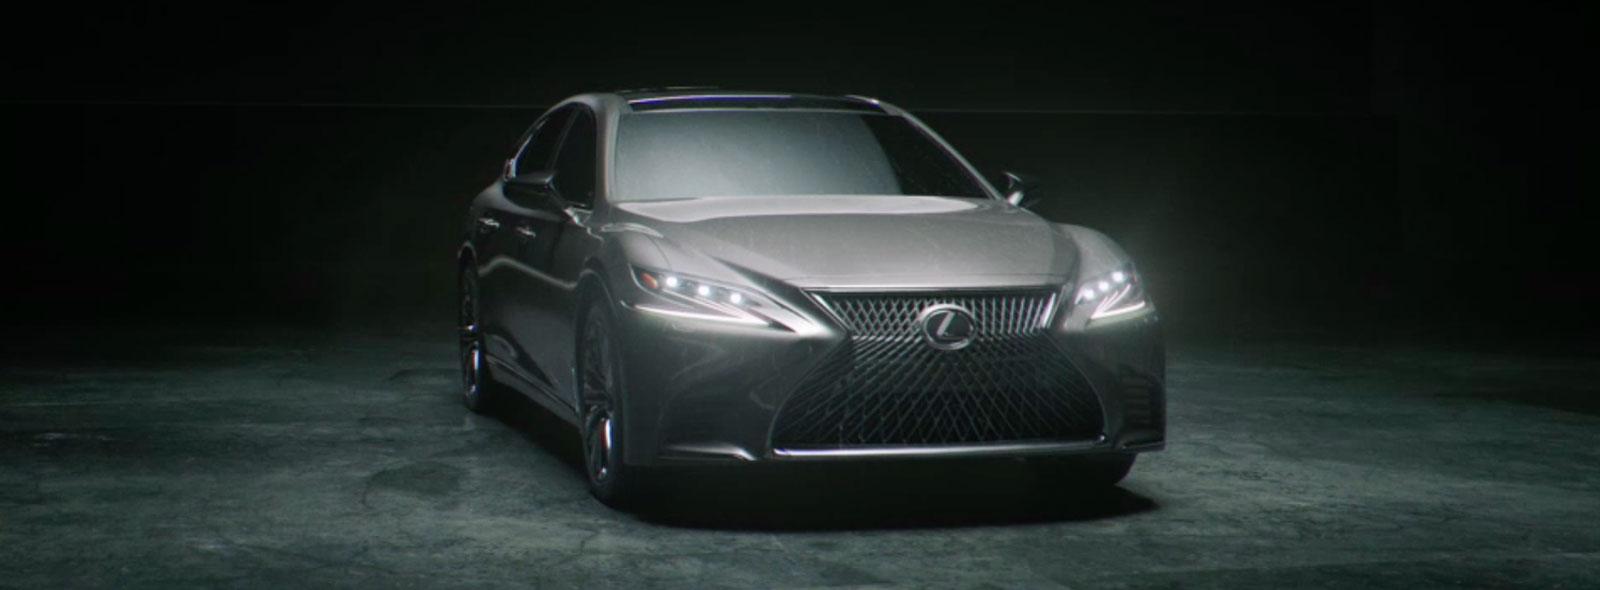 Videobild Lexus LS 500